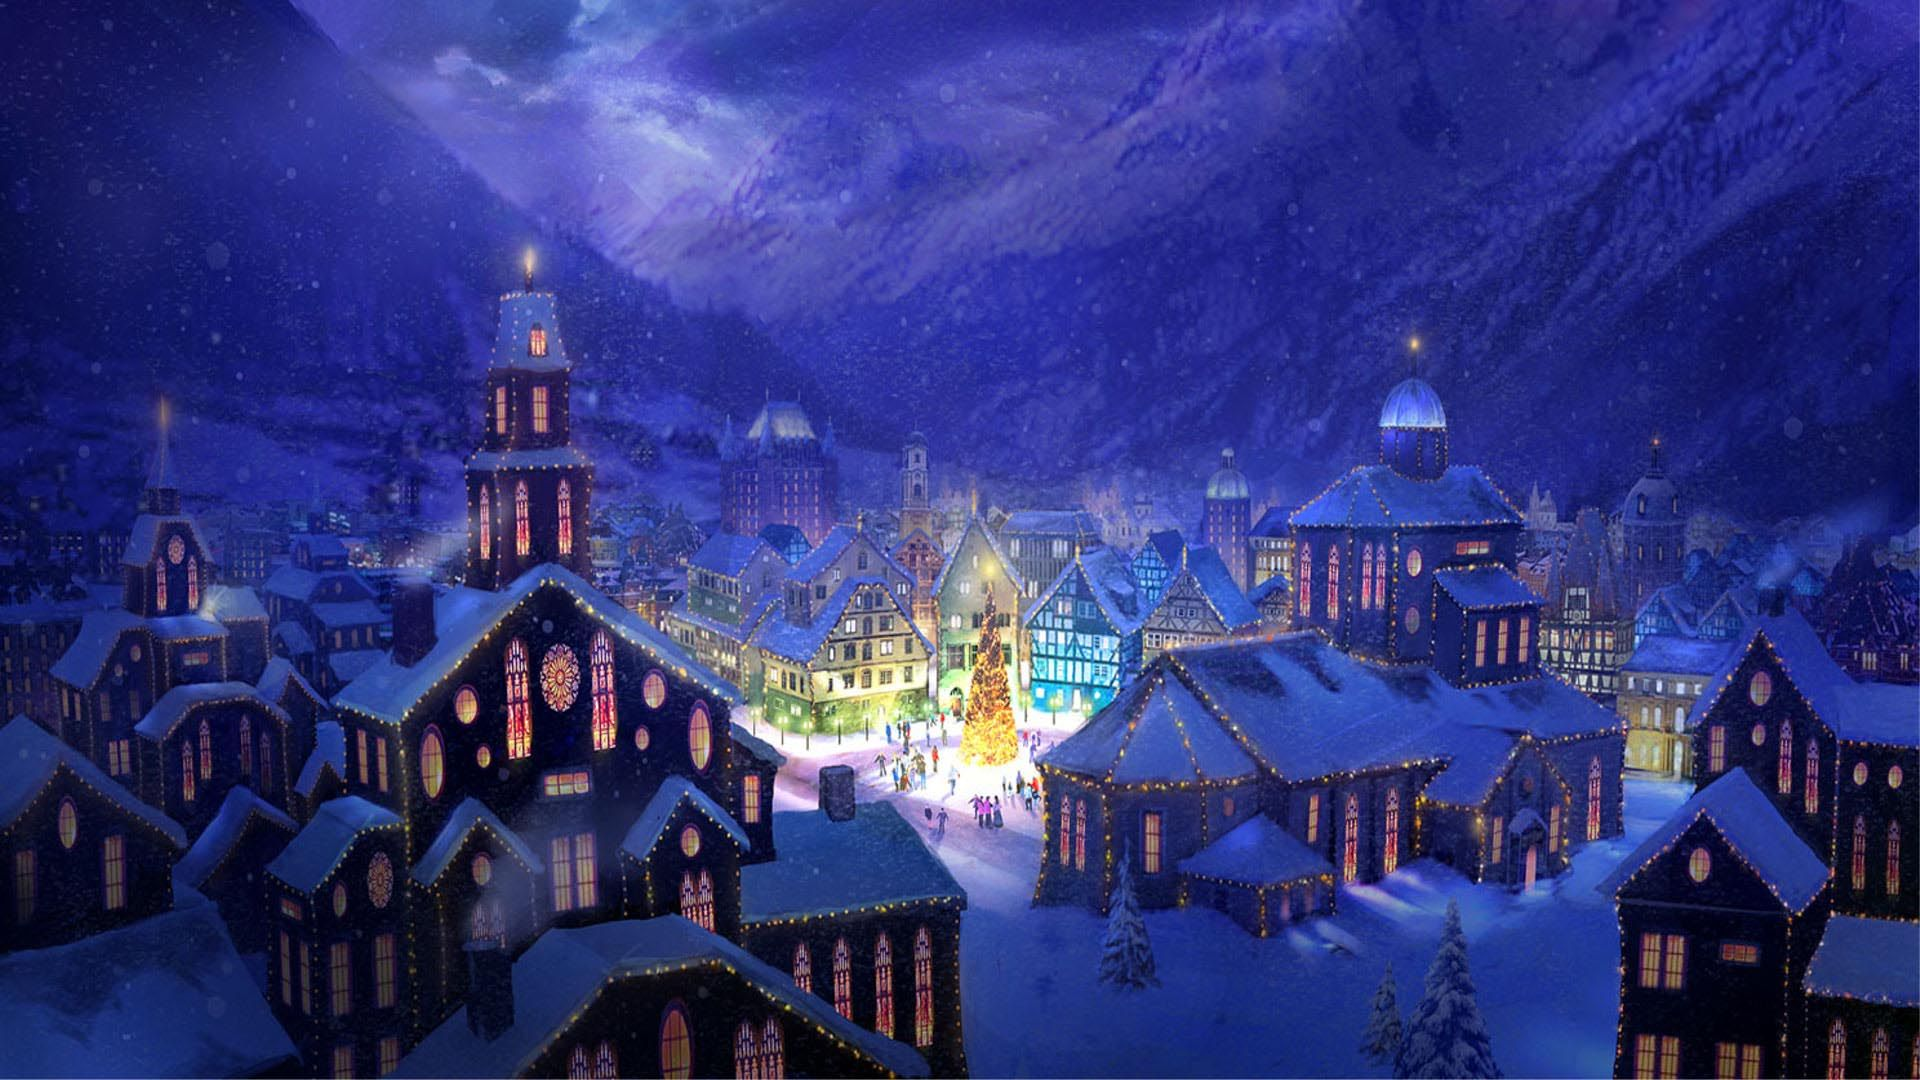 Christmas Landscapes Christmas Village Square Hd Wallpaper Fullhdwpp Full Hd Christmas Town Christmas Wallpaper Hd Christmas Landscape